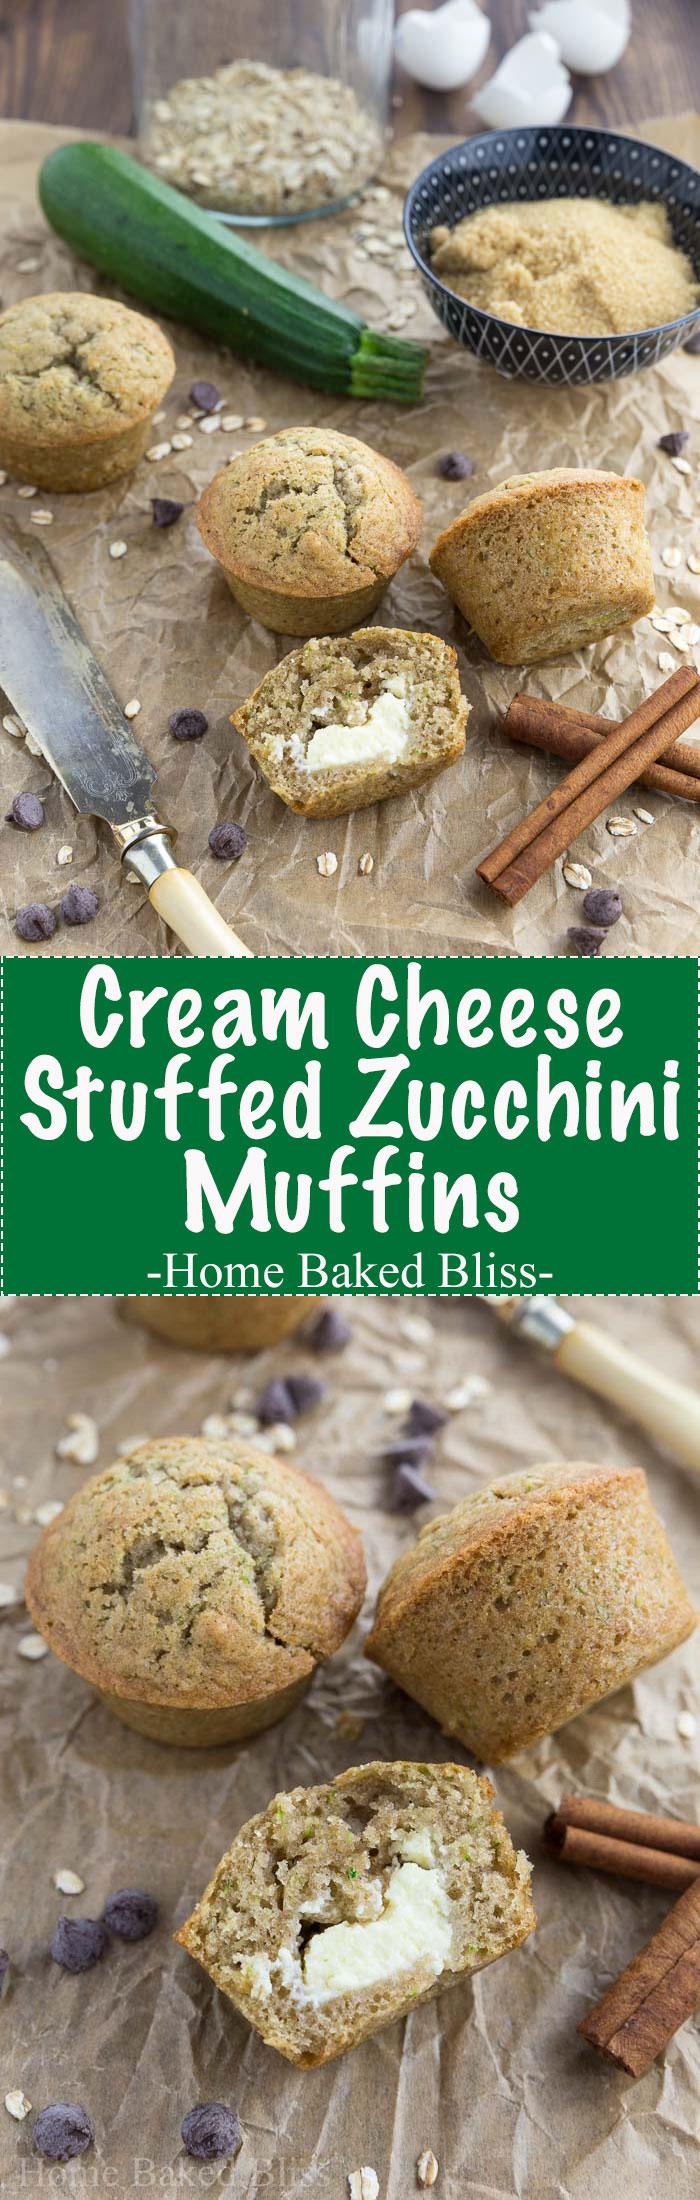 Cream cheese stuffed zucchini muffins next to a green zucchini and a butter knife